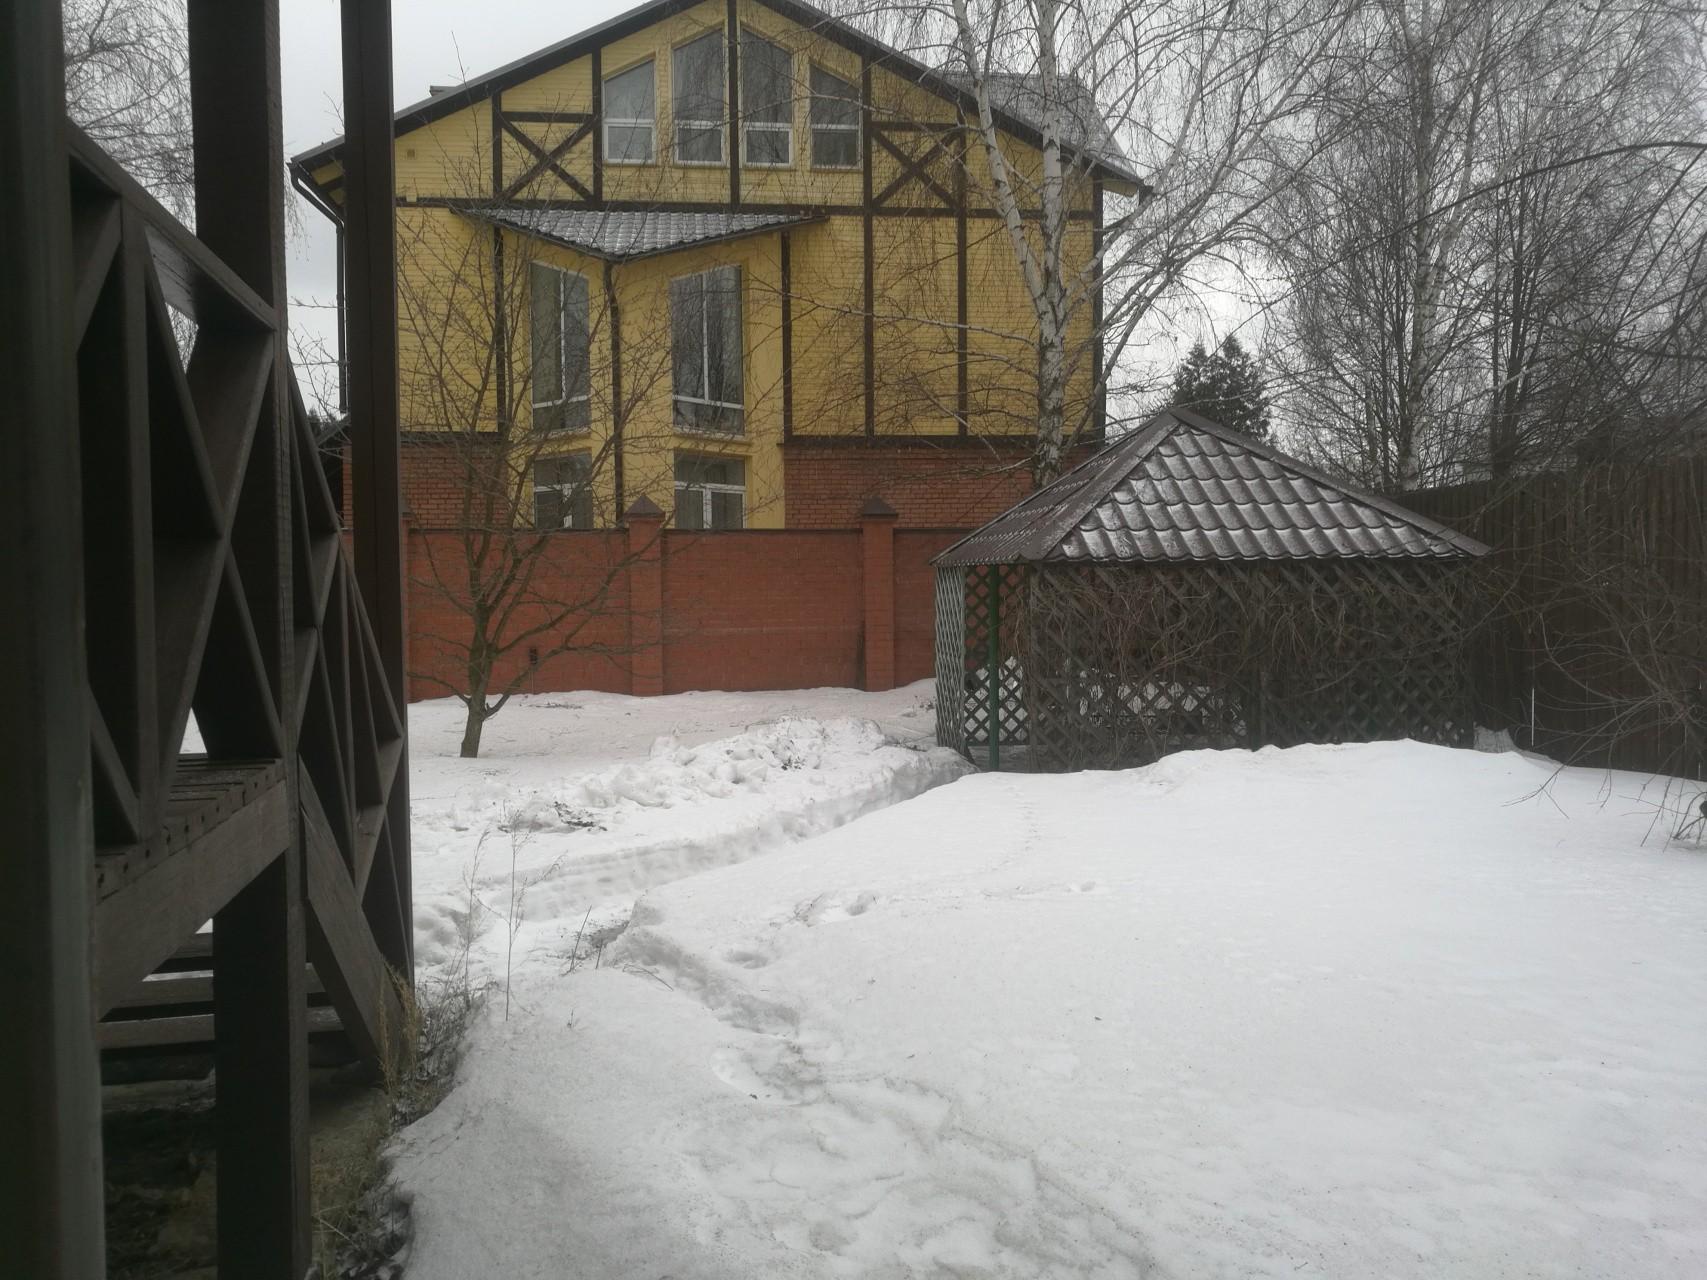 поселок родники раменский район фото